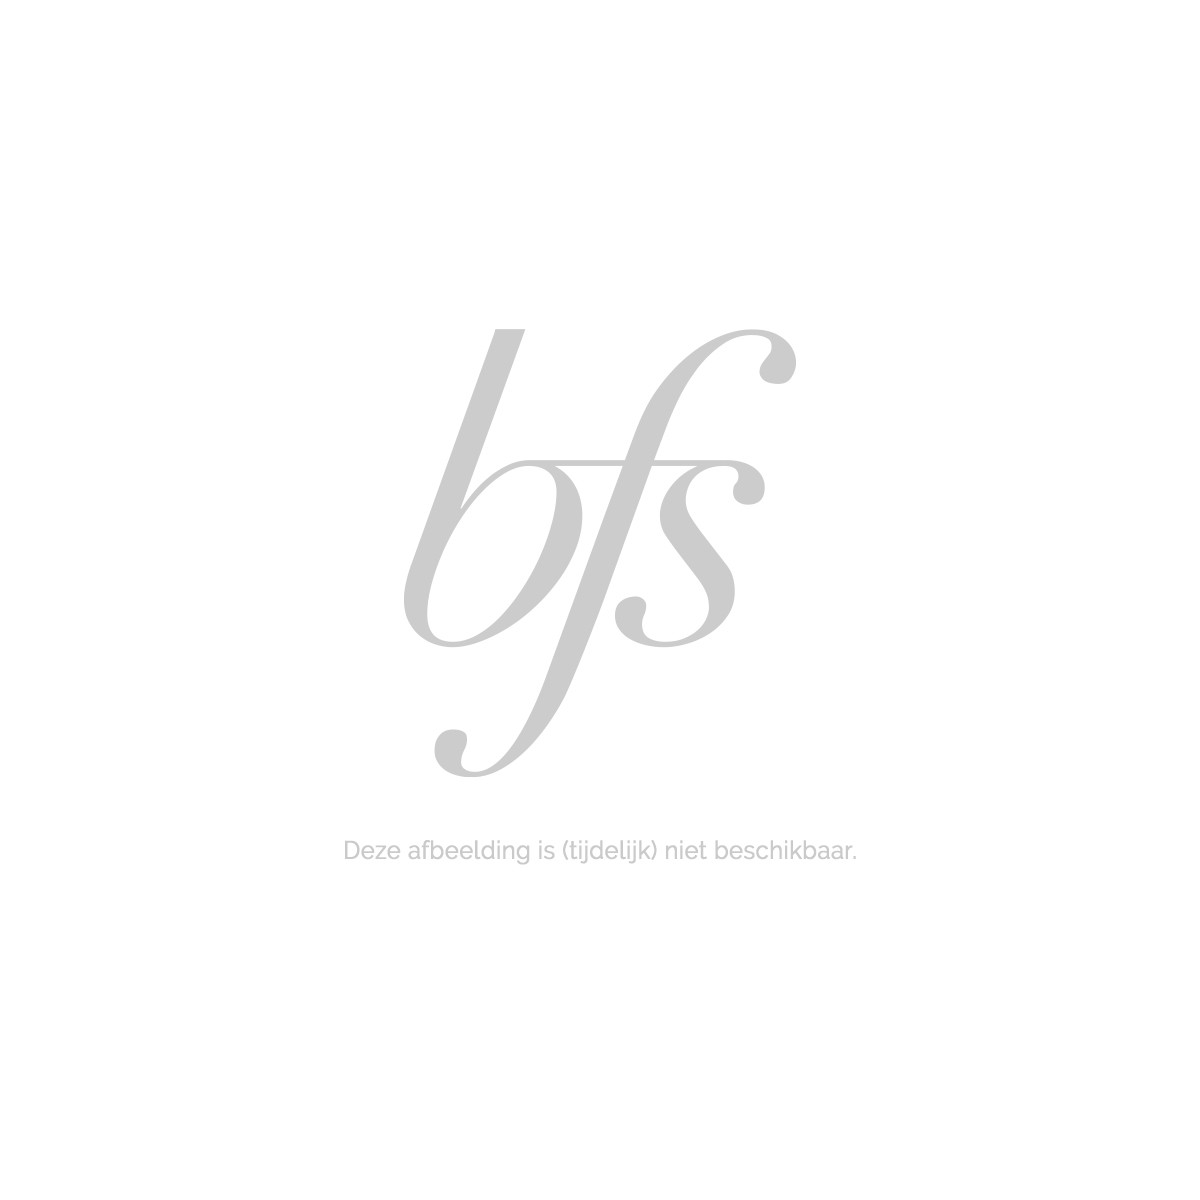 Body and Bess Serum Anti Wrinkle 5 X 3 Ml